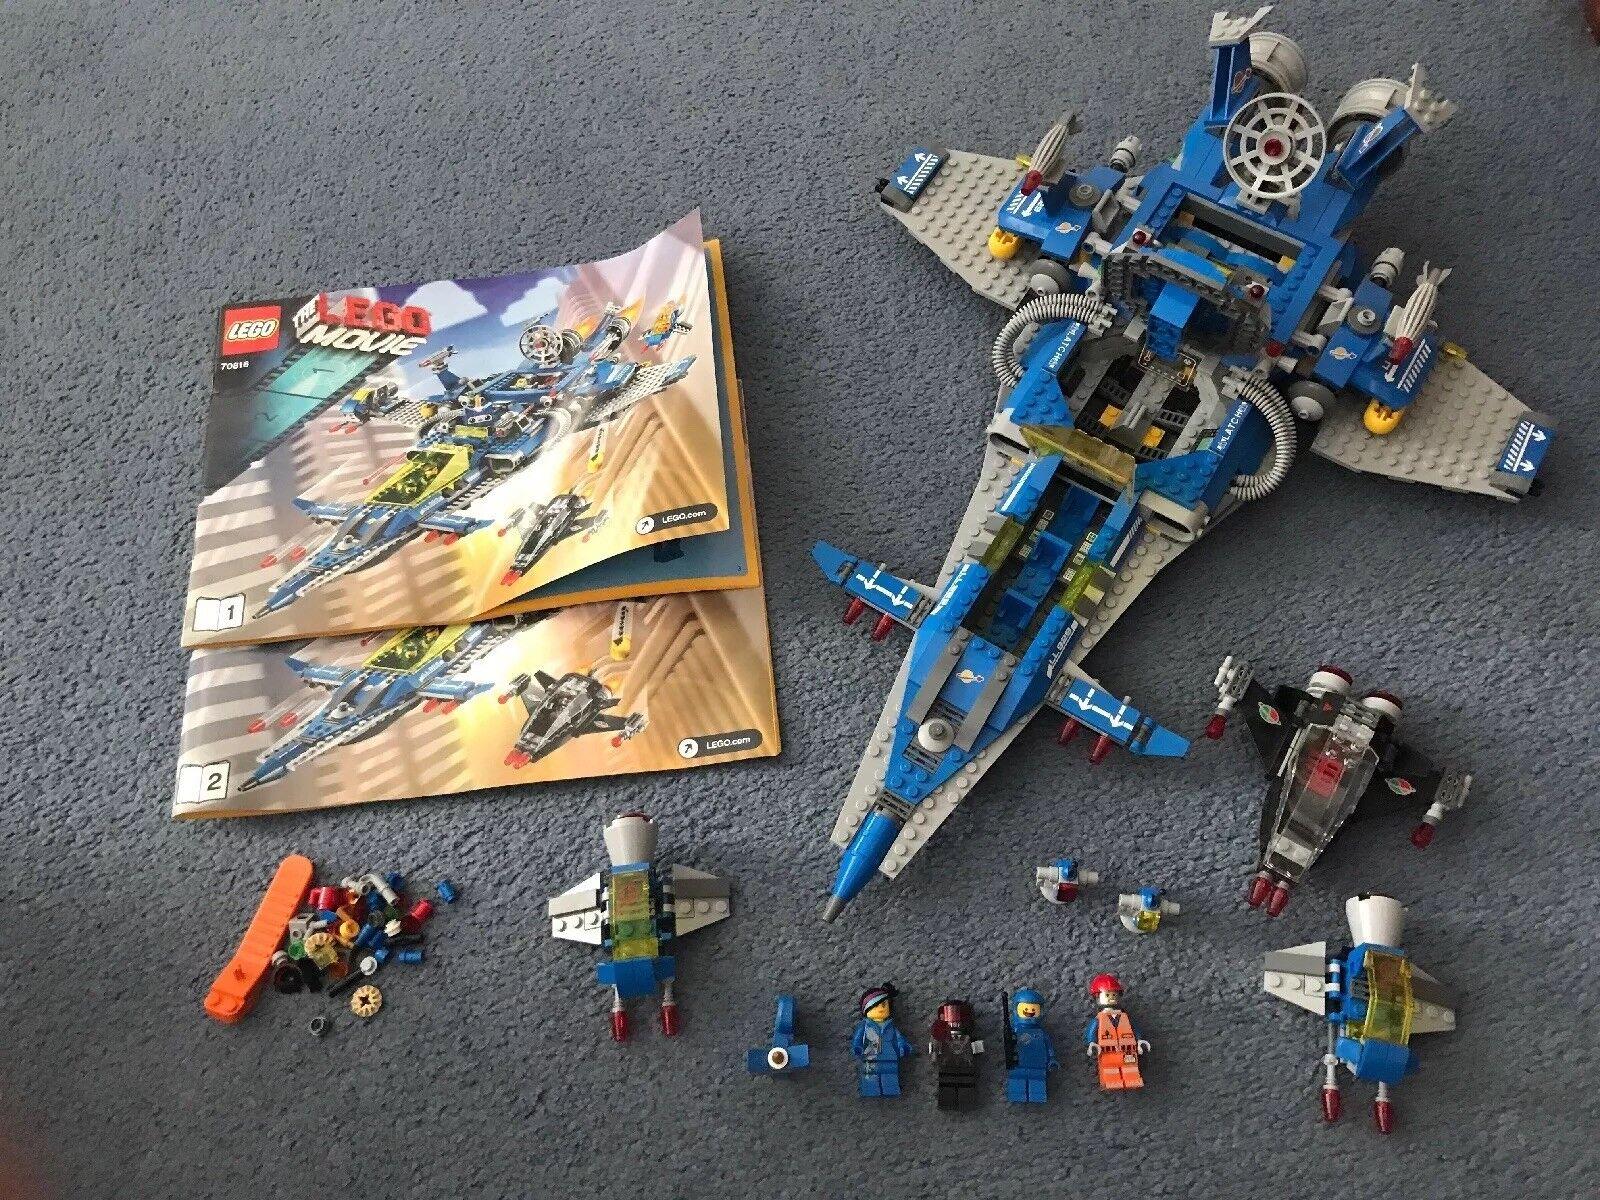 LEGO THE LEGO MOVIE BENNY'S SPACESHIP 70816 Excellent